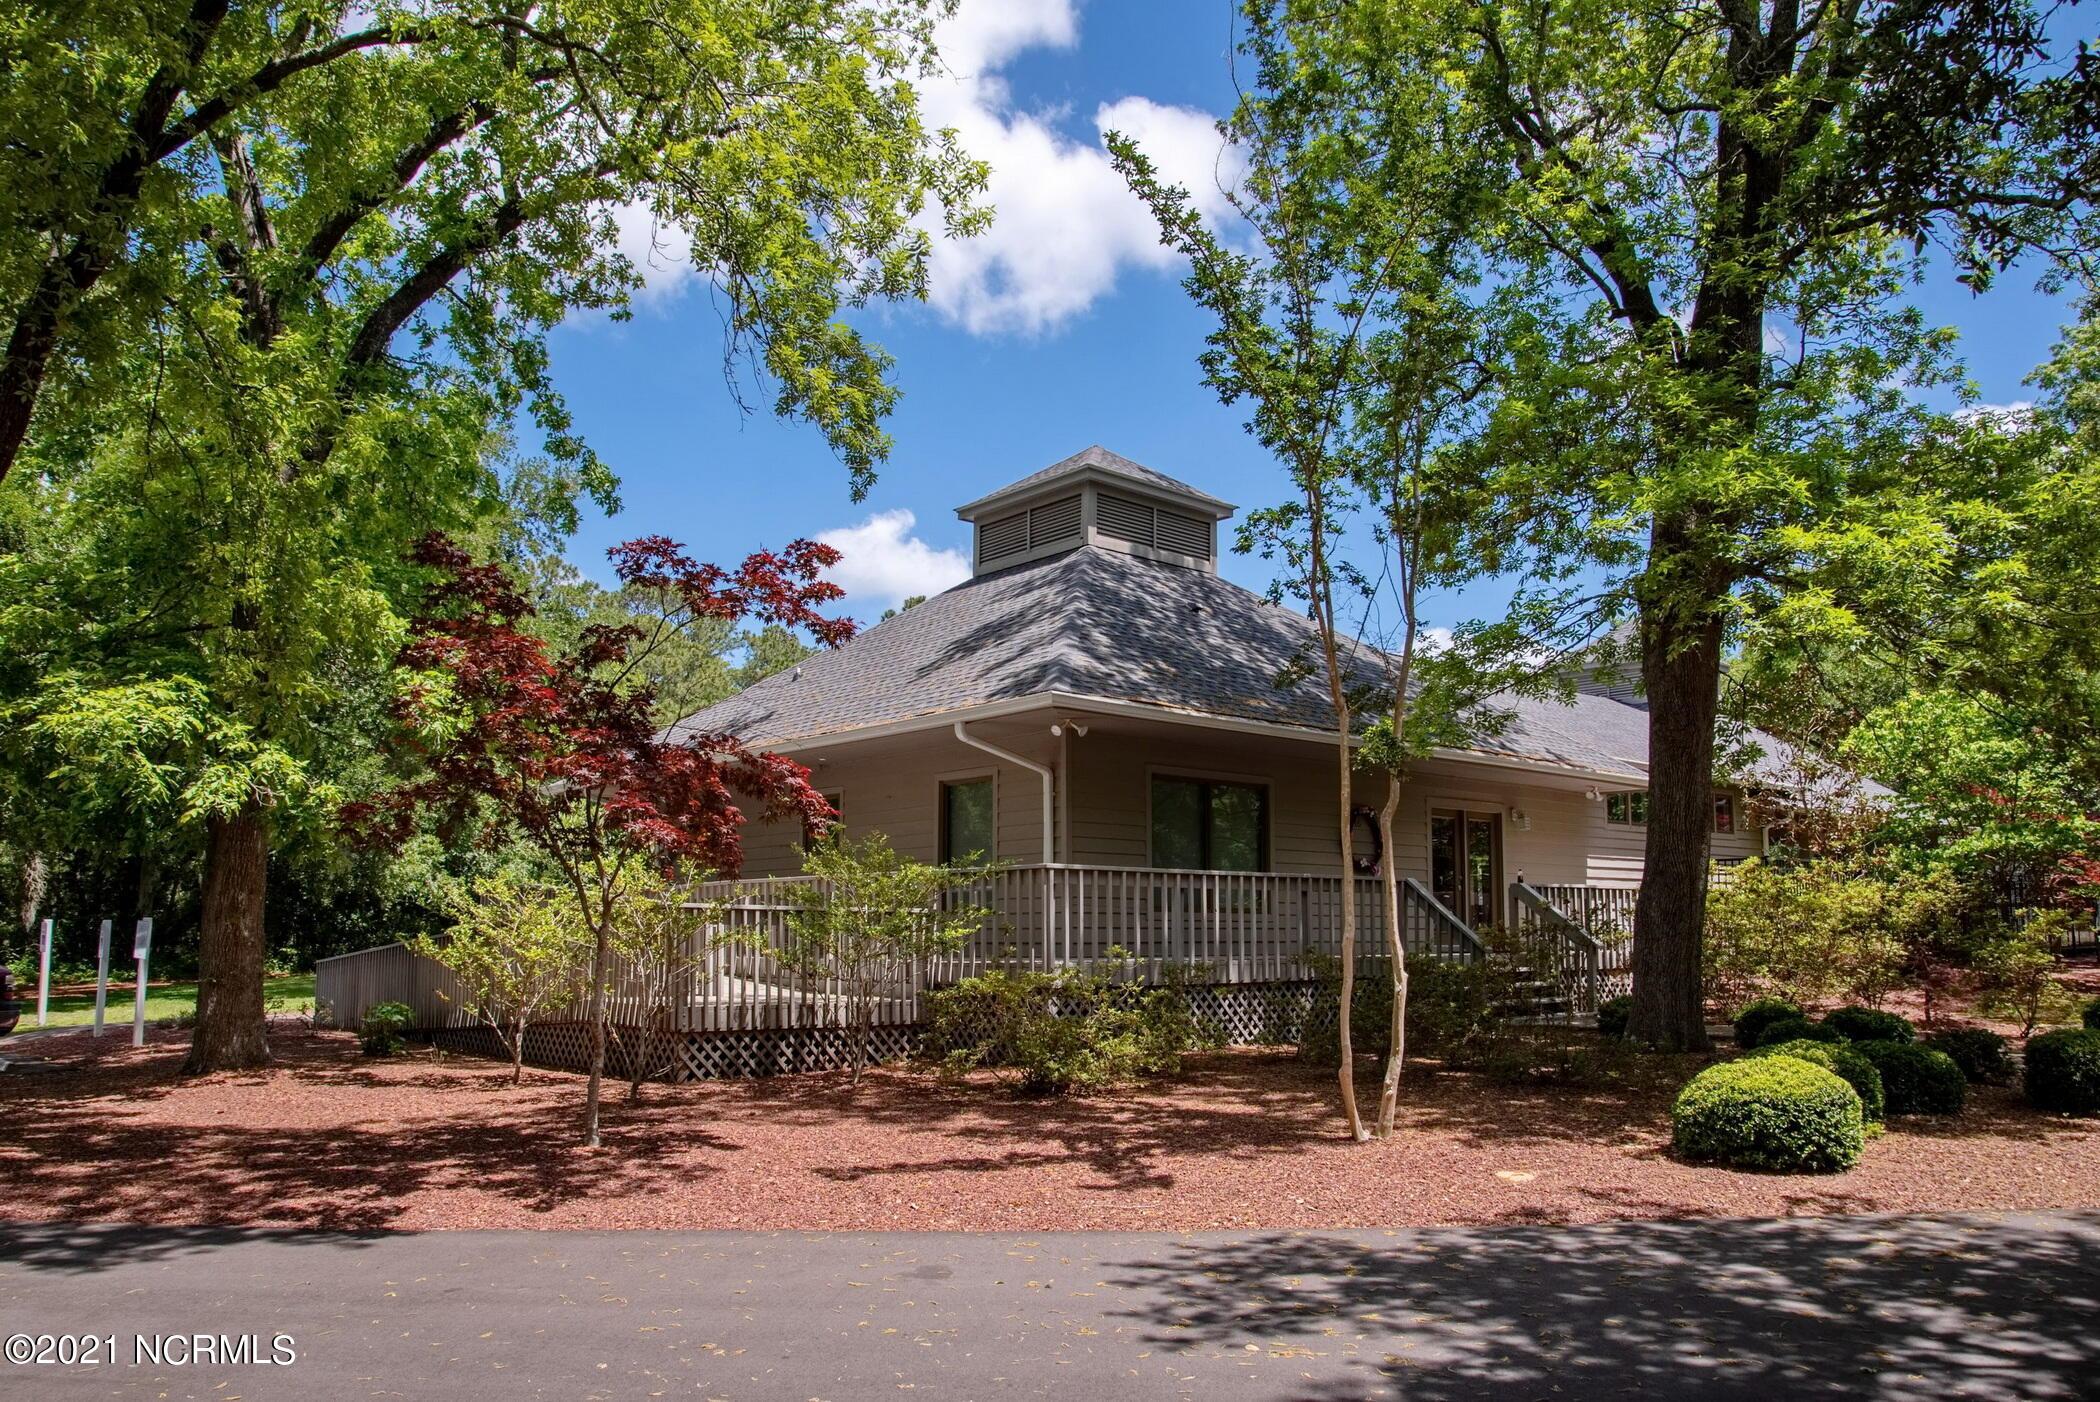 3195 Mullet Creek Place, Bolivia, North Carolina 28422, ,Residential land,For sale,Mullet Creek,100285134